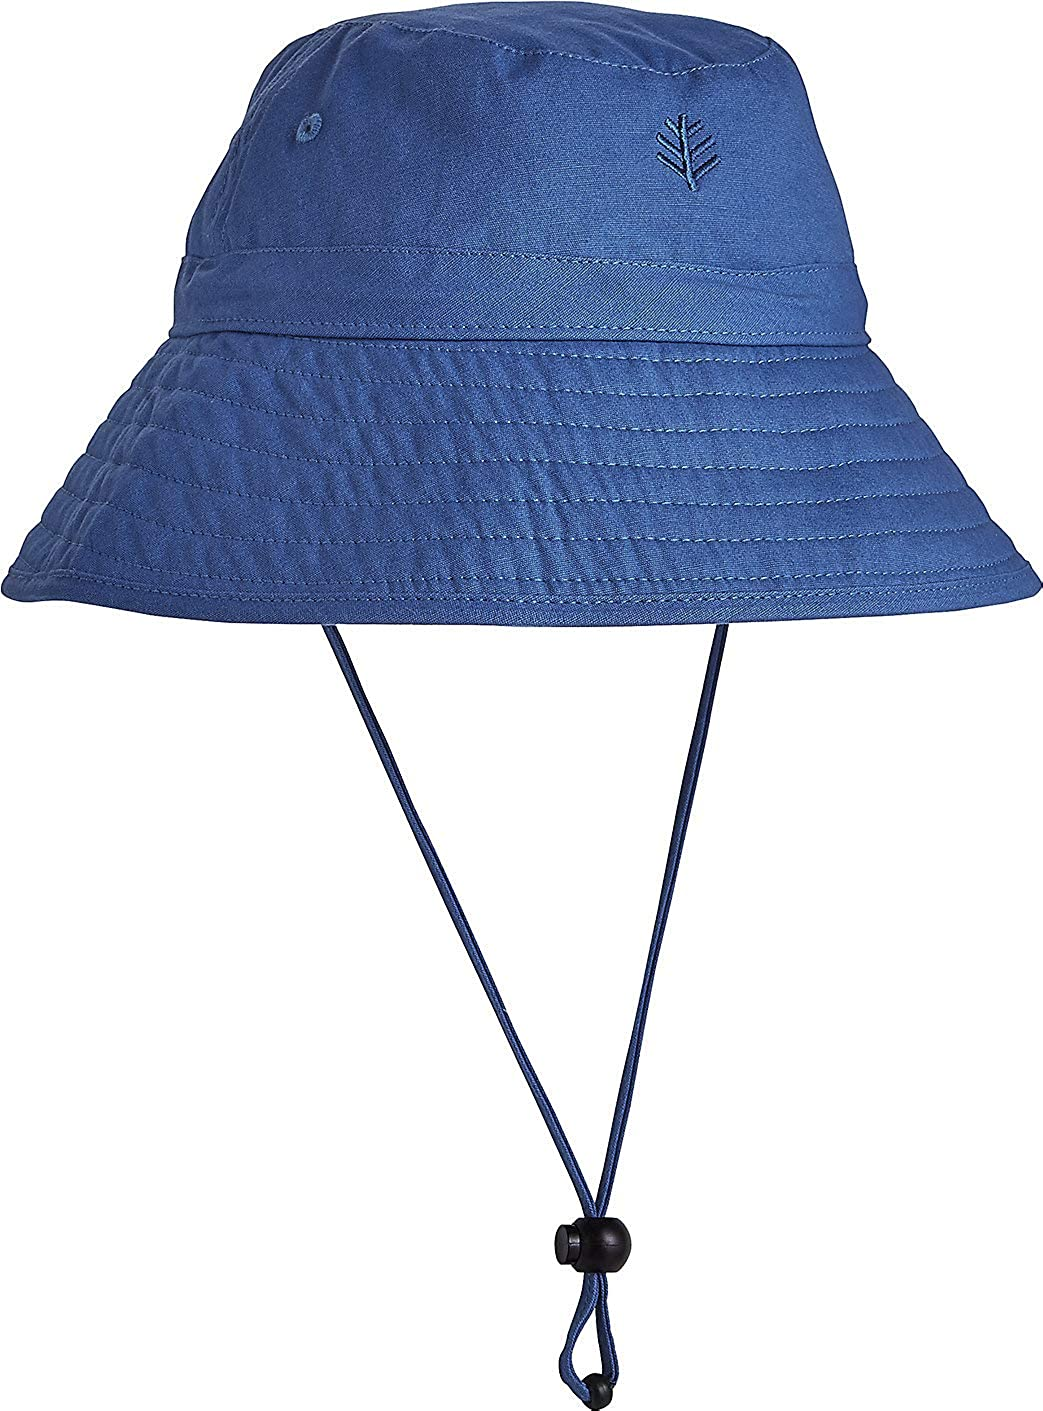 Amazon.com  Coolibar UPF 50+ Kids  Chin Strap Hat - Sun Protective  Clothing c835403c1b36